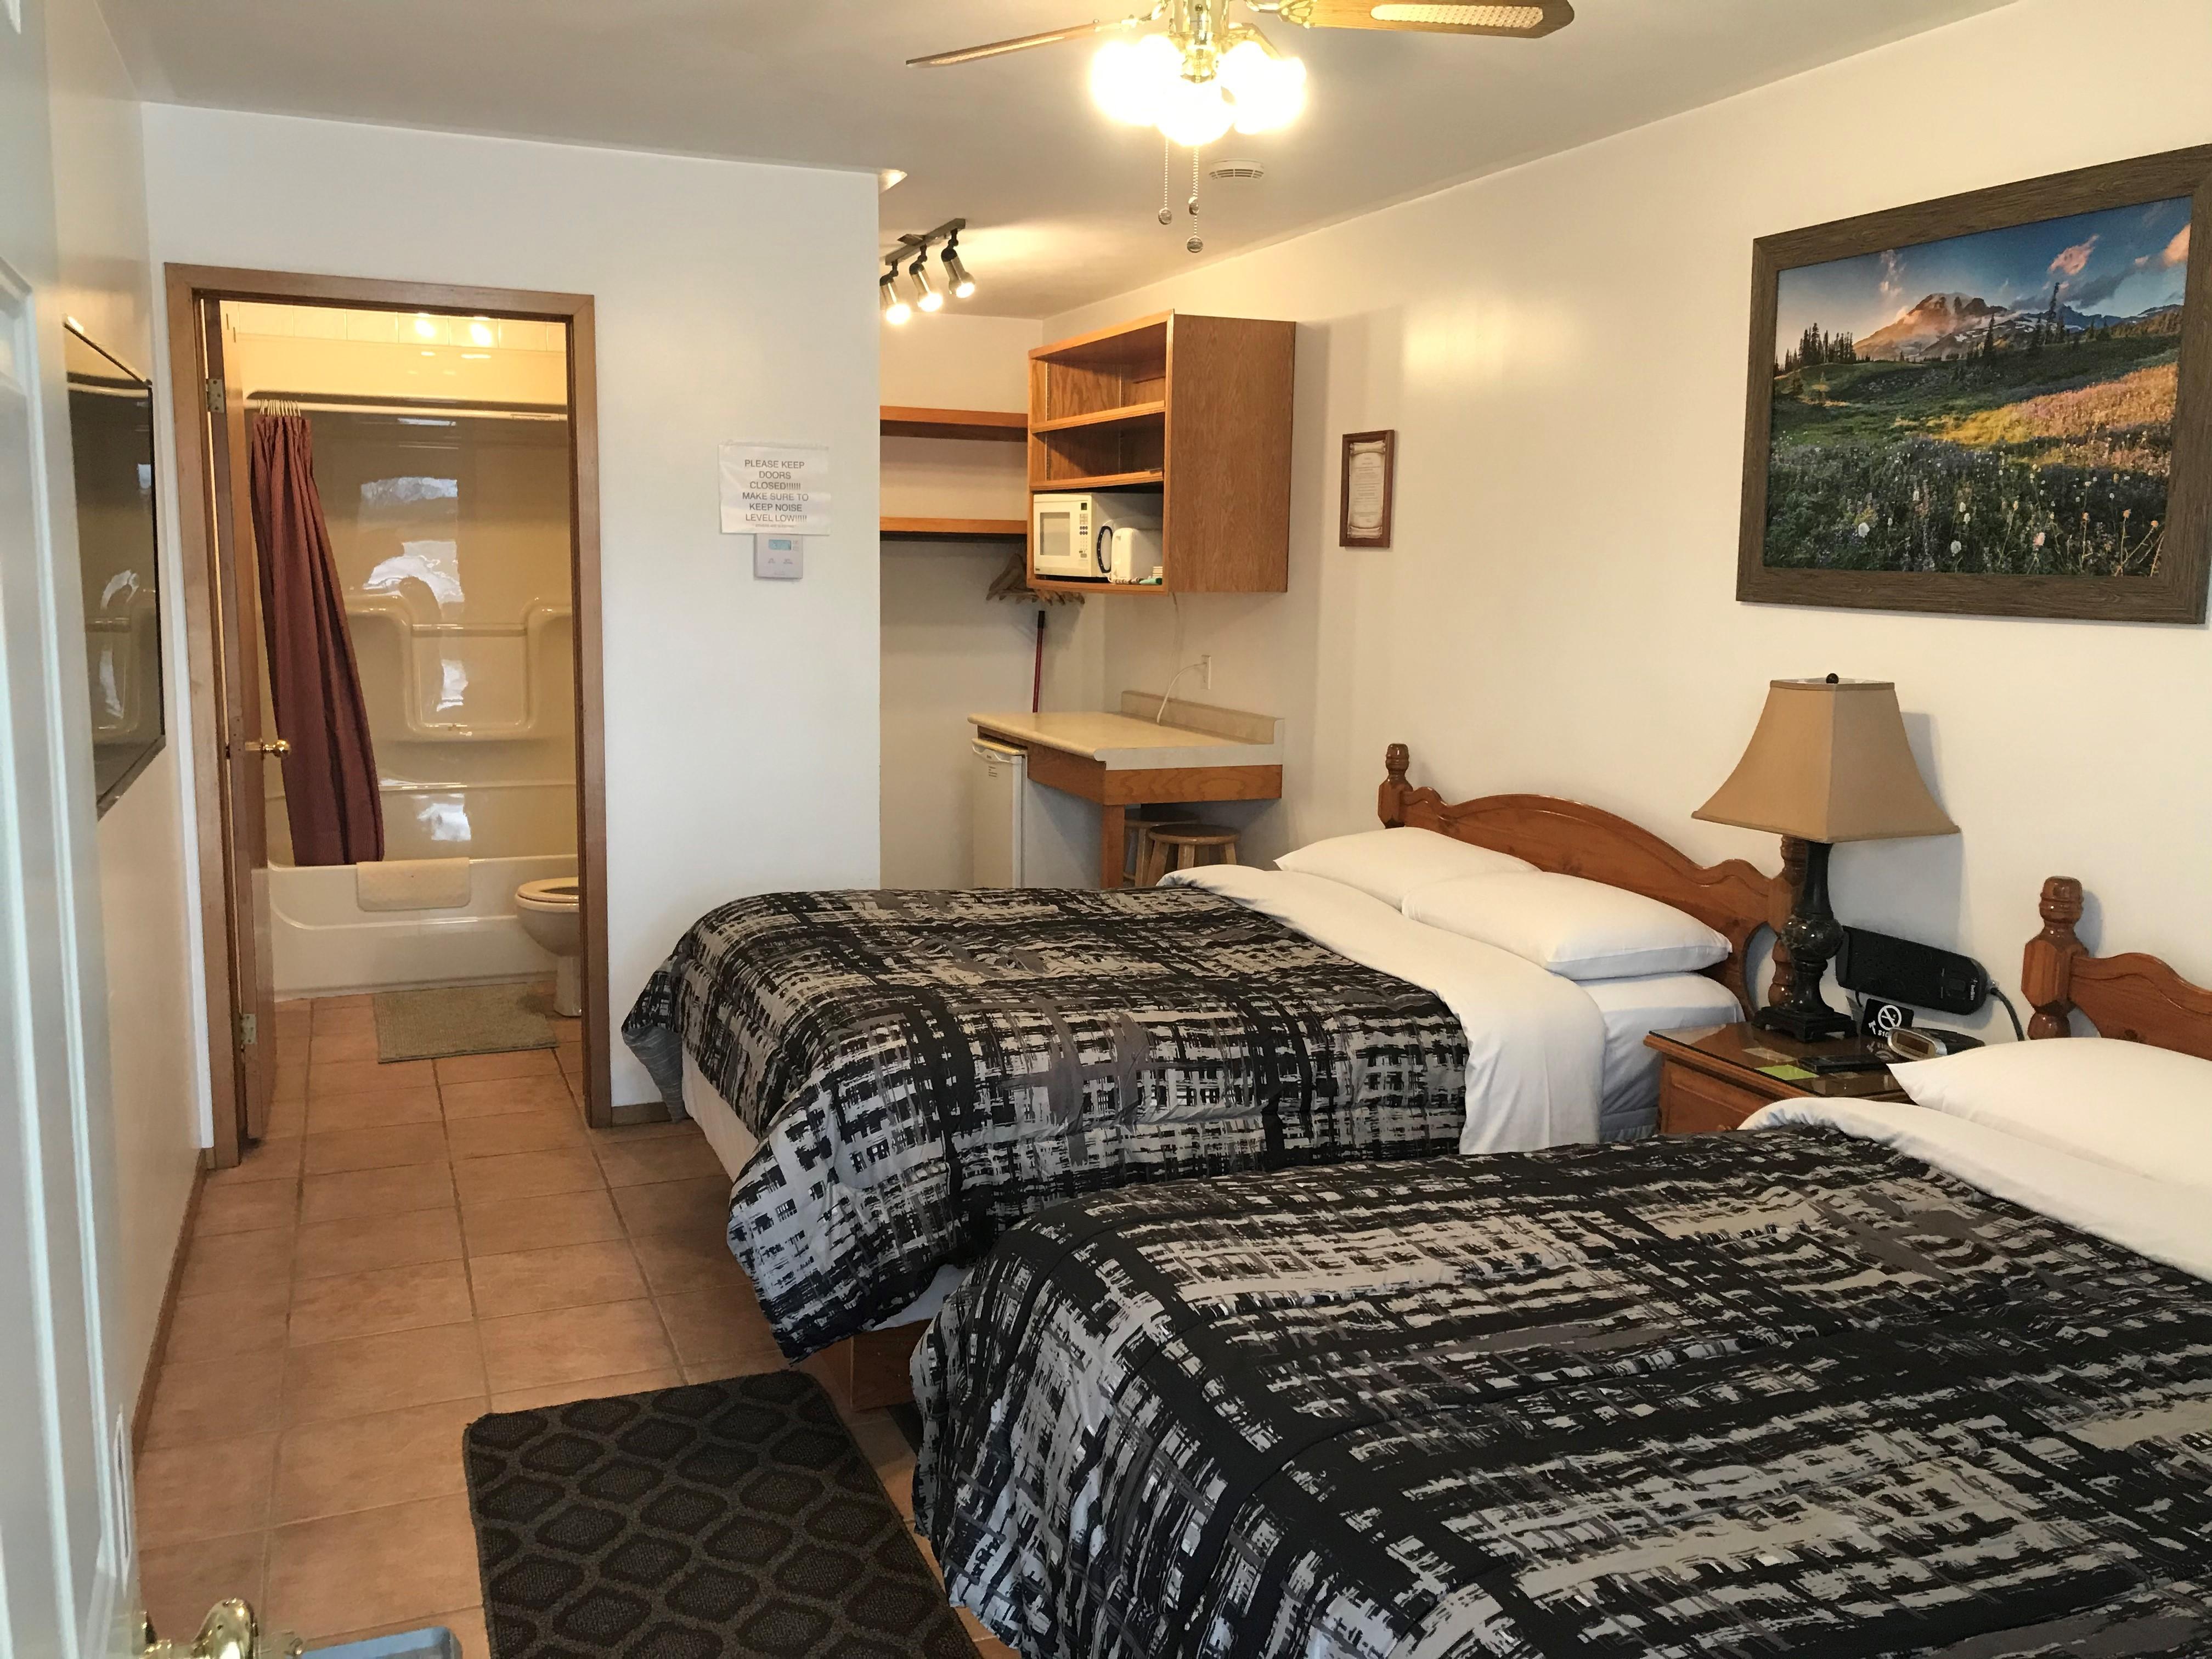 https://0901.nccdn.net/4_2/000/000/024/ec9/jays-motel-room-with-2-beds.jpg